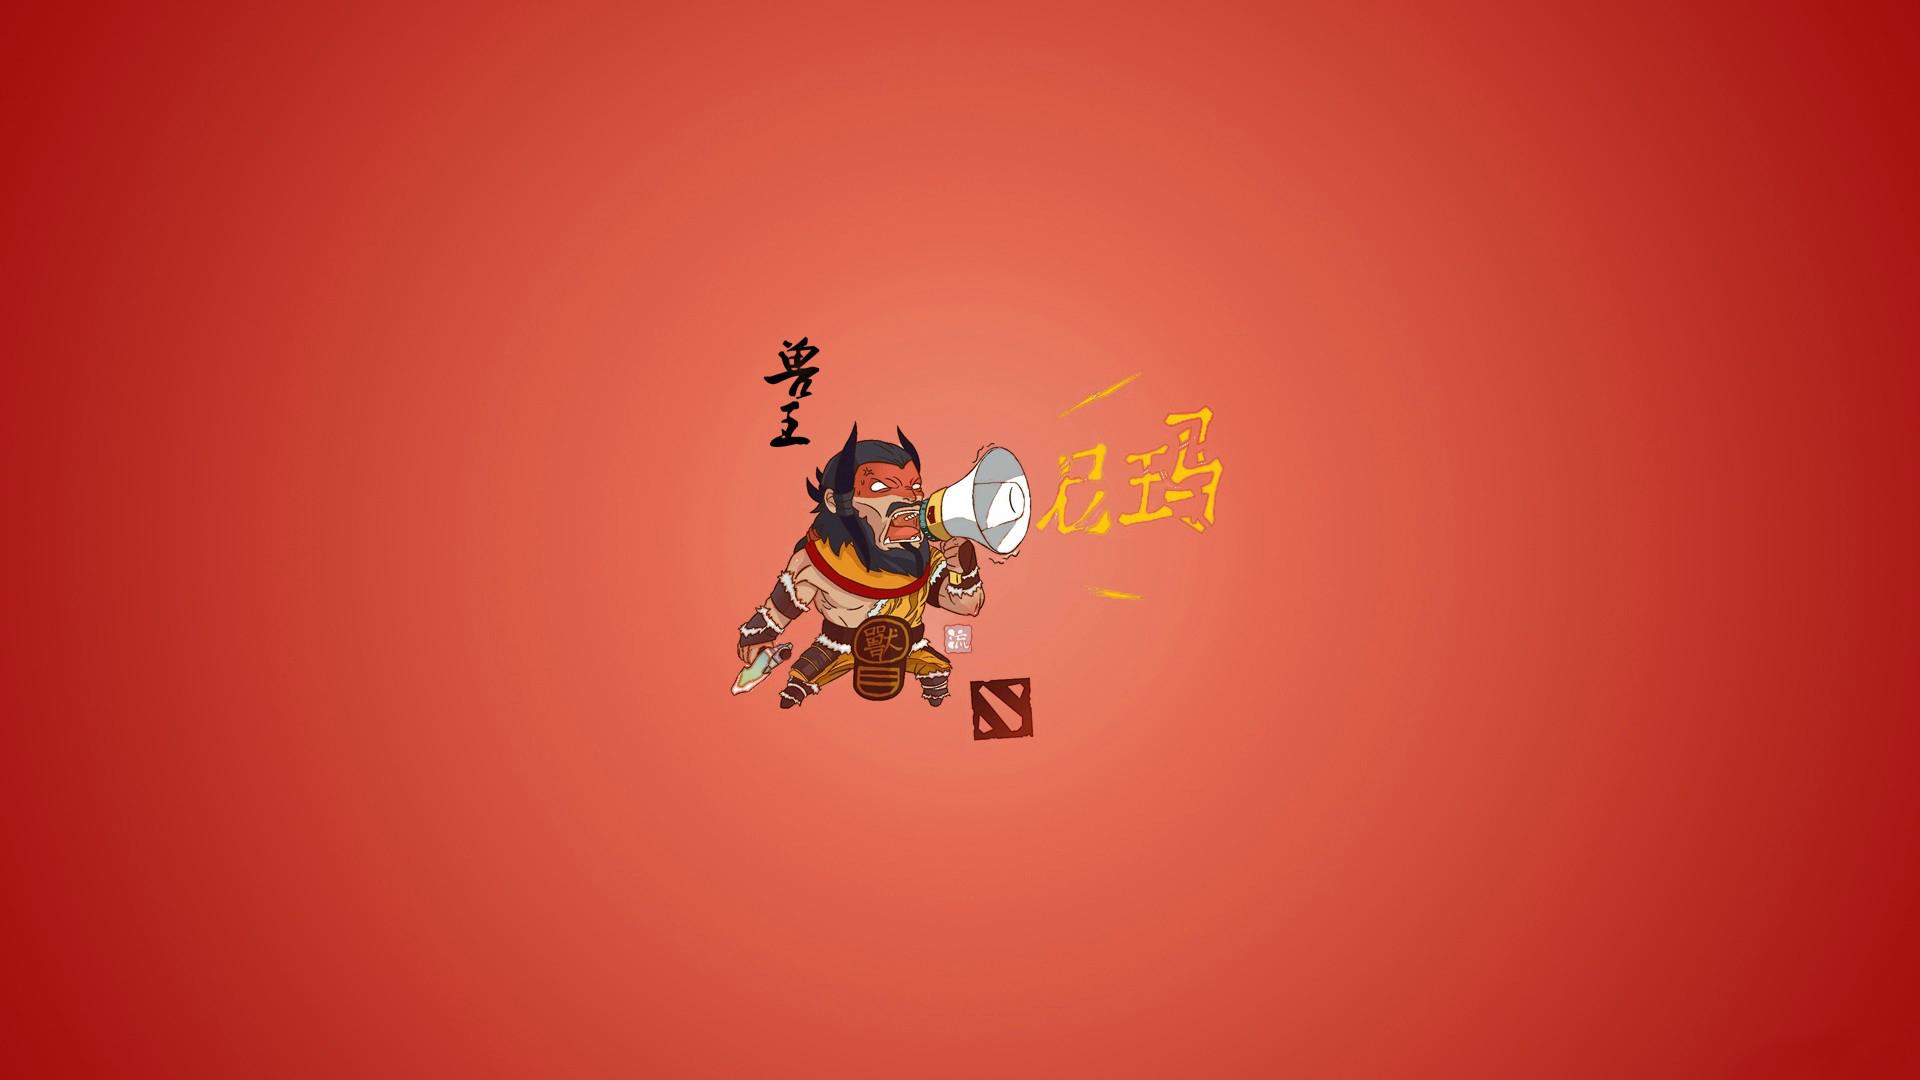 Beastmaster Chibi 0d HD Wallpaper